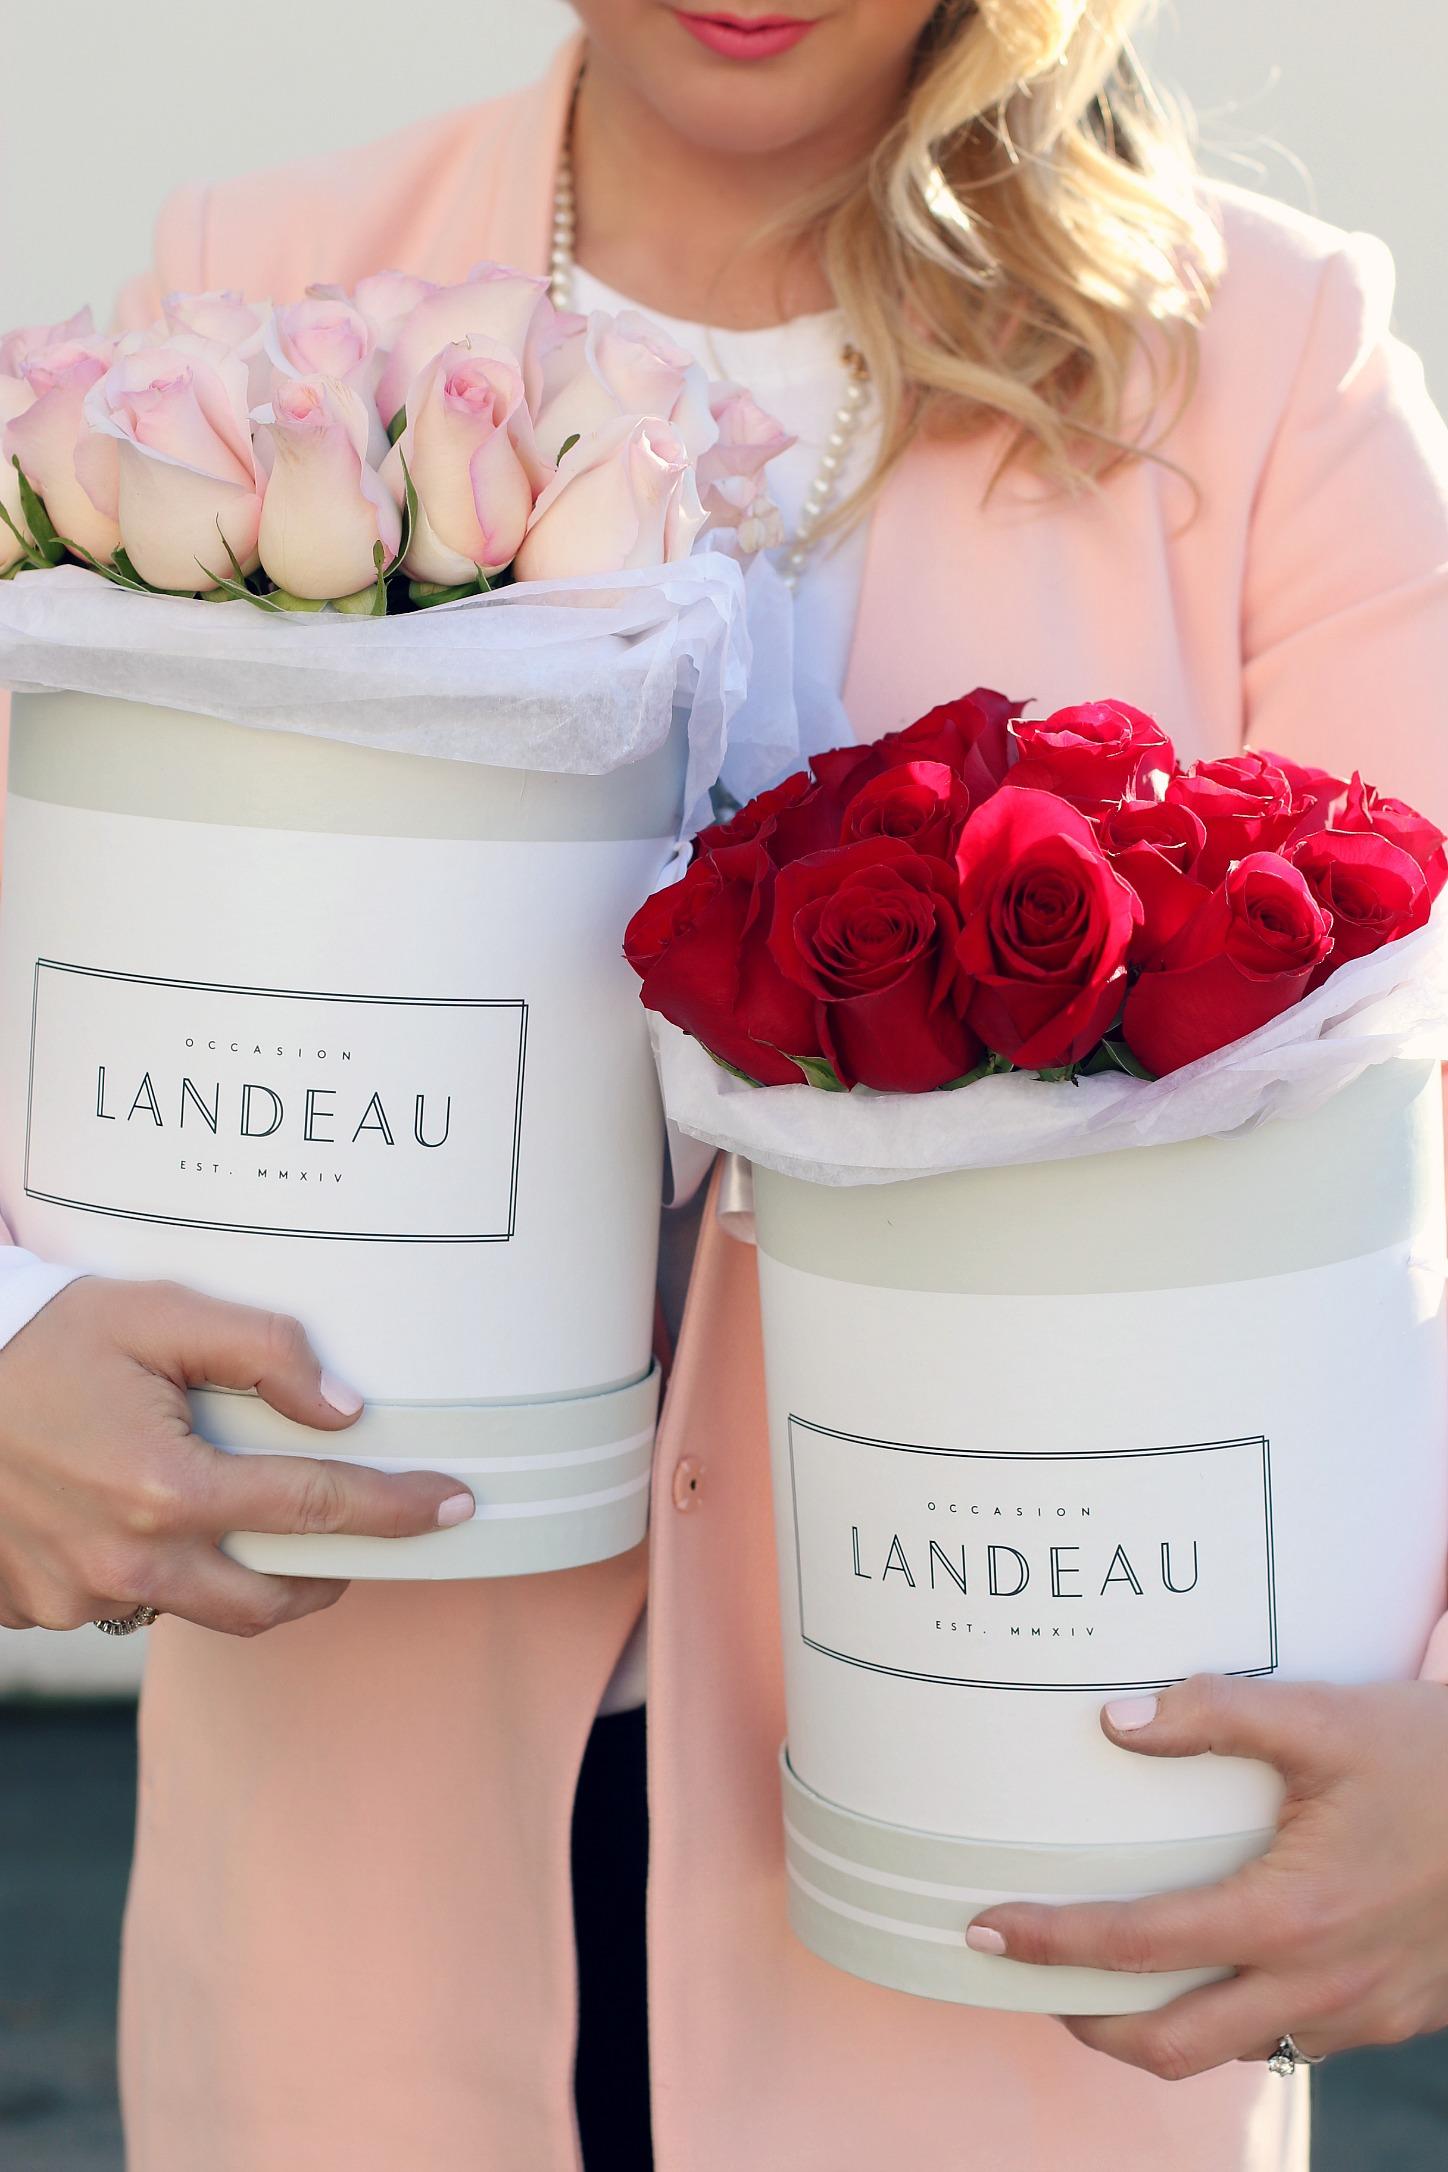 Valentine's Day Give Landeau roses Monika Hibbs